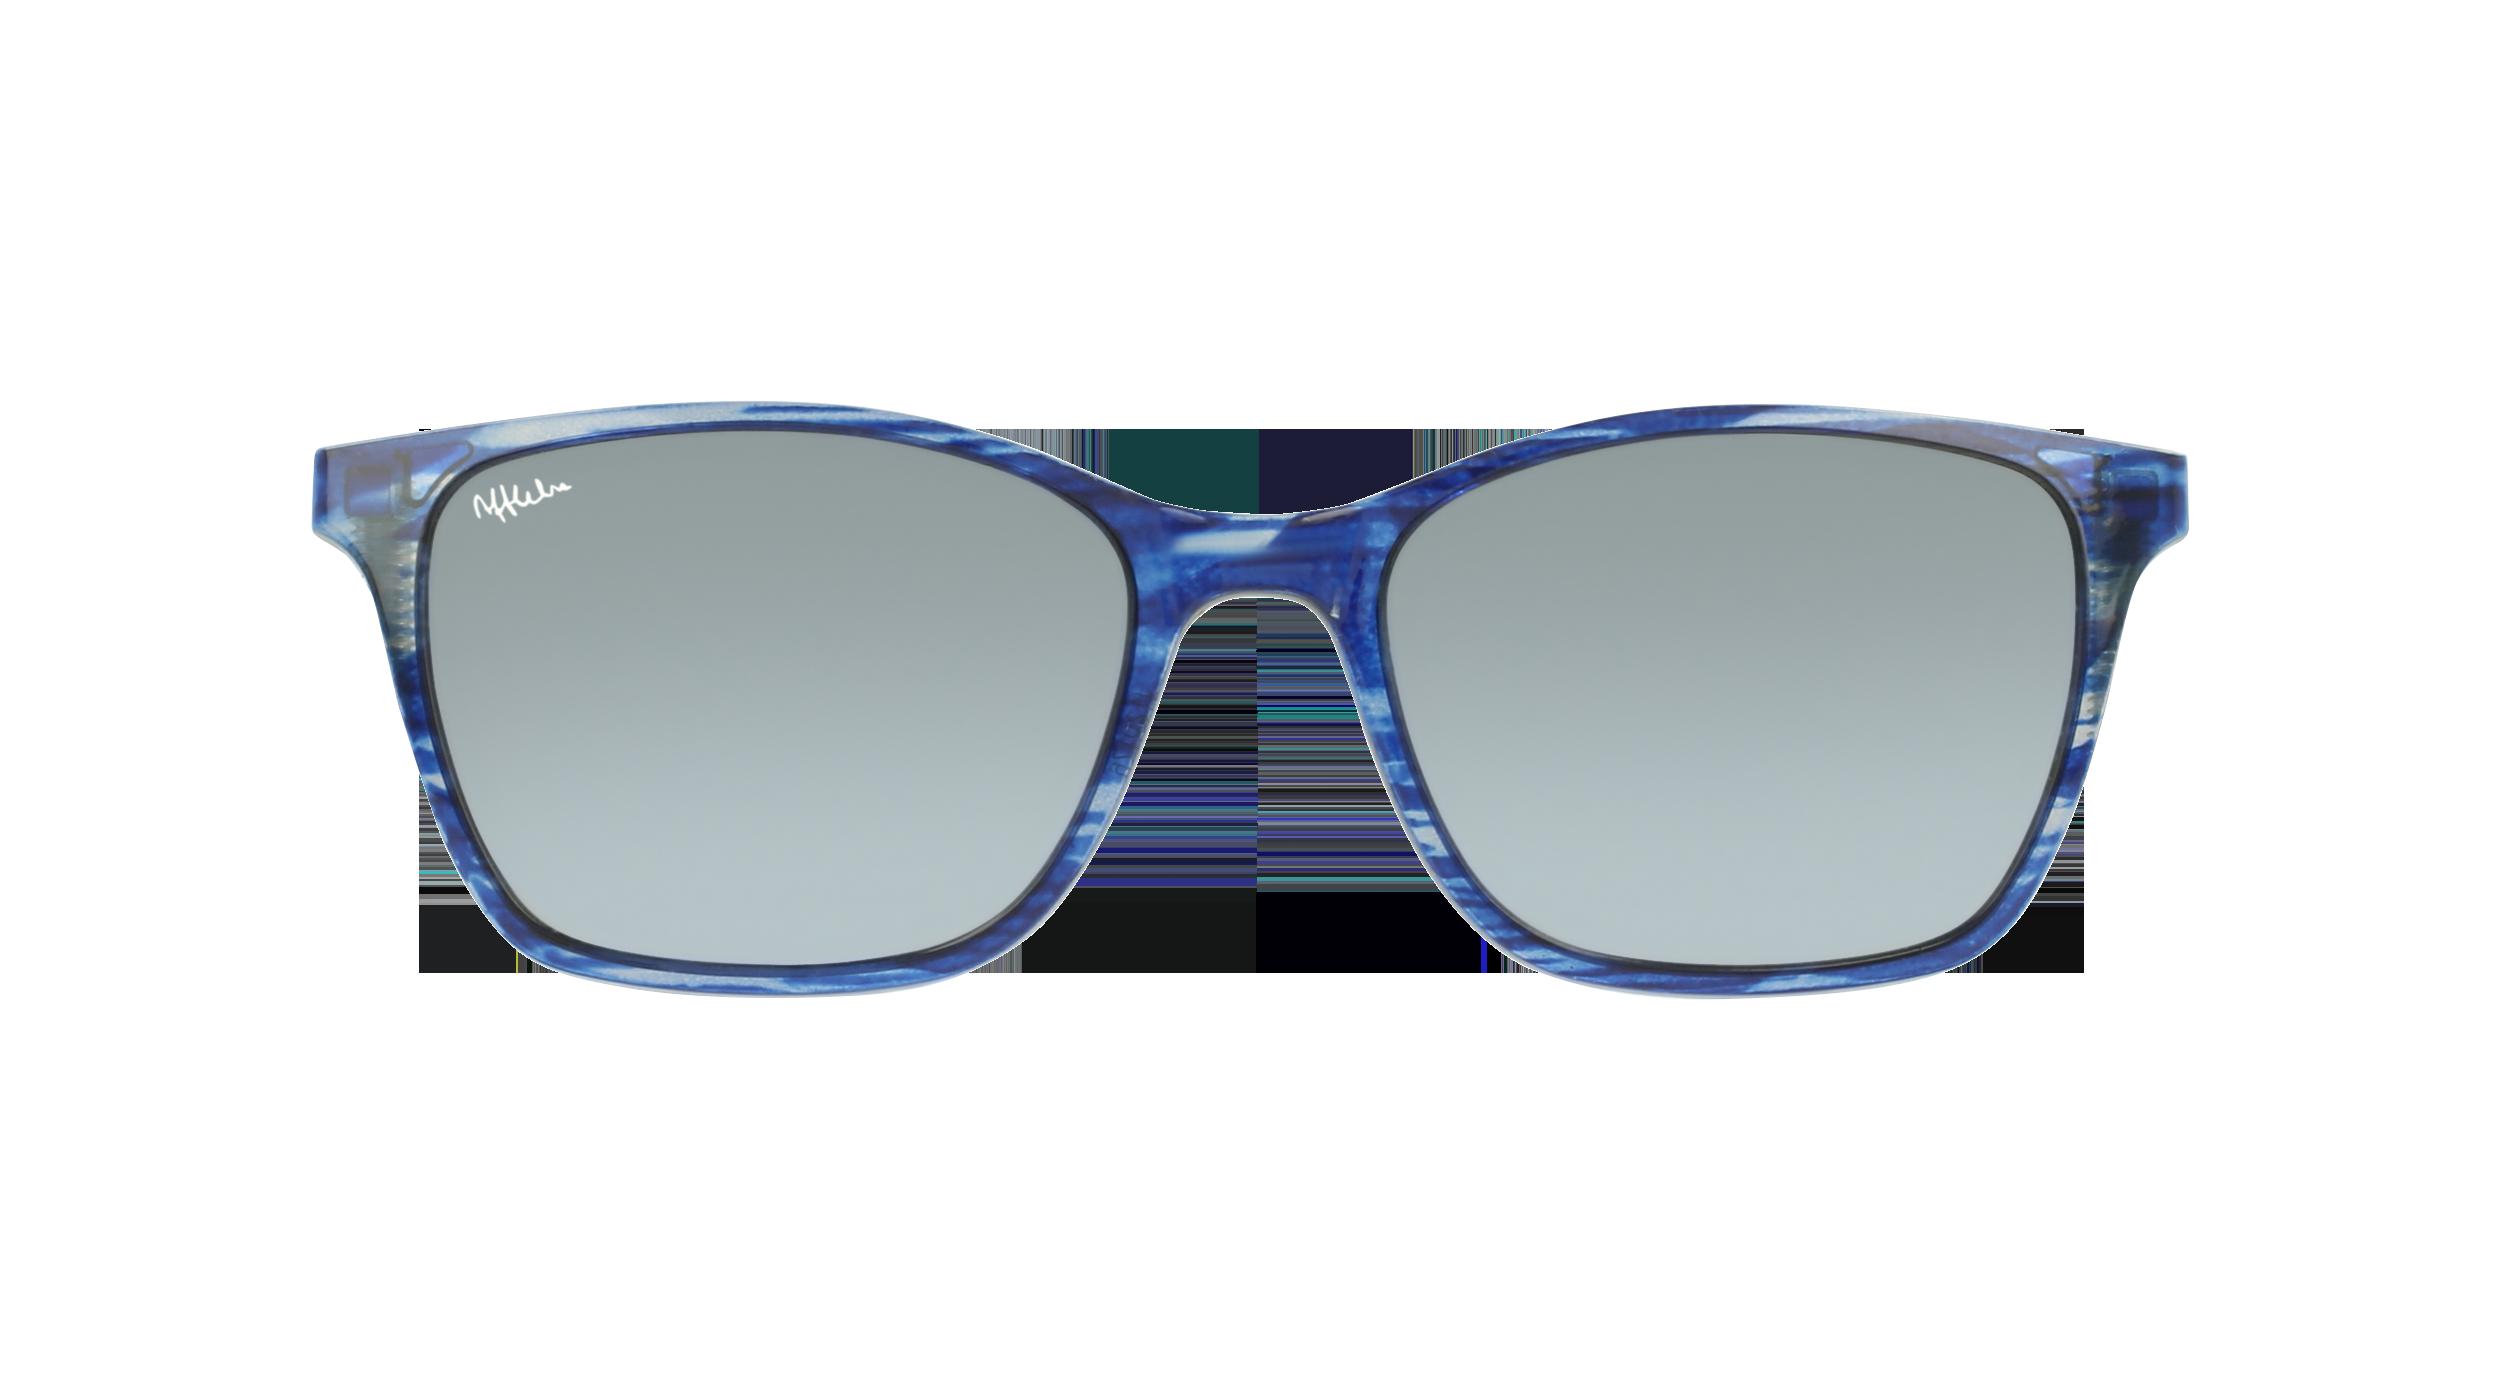 afflelou/france/products/smart_clip/clips_glasses/07630036457658.png